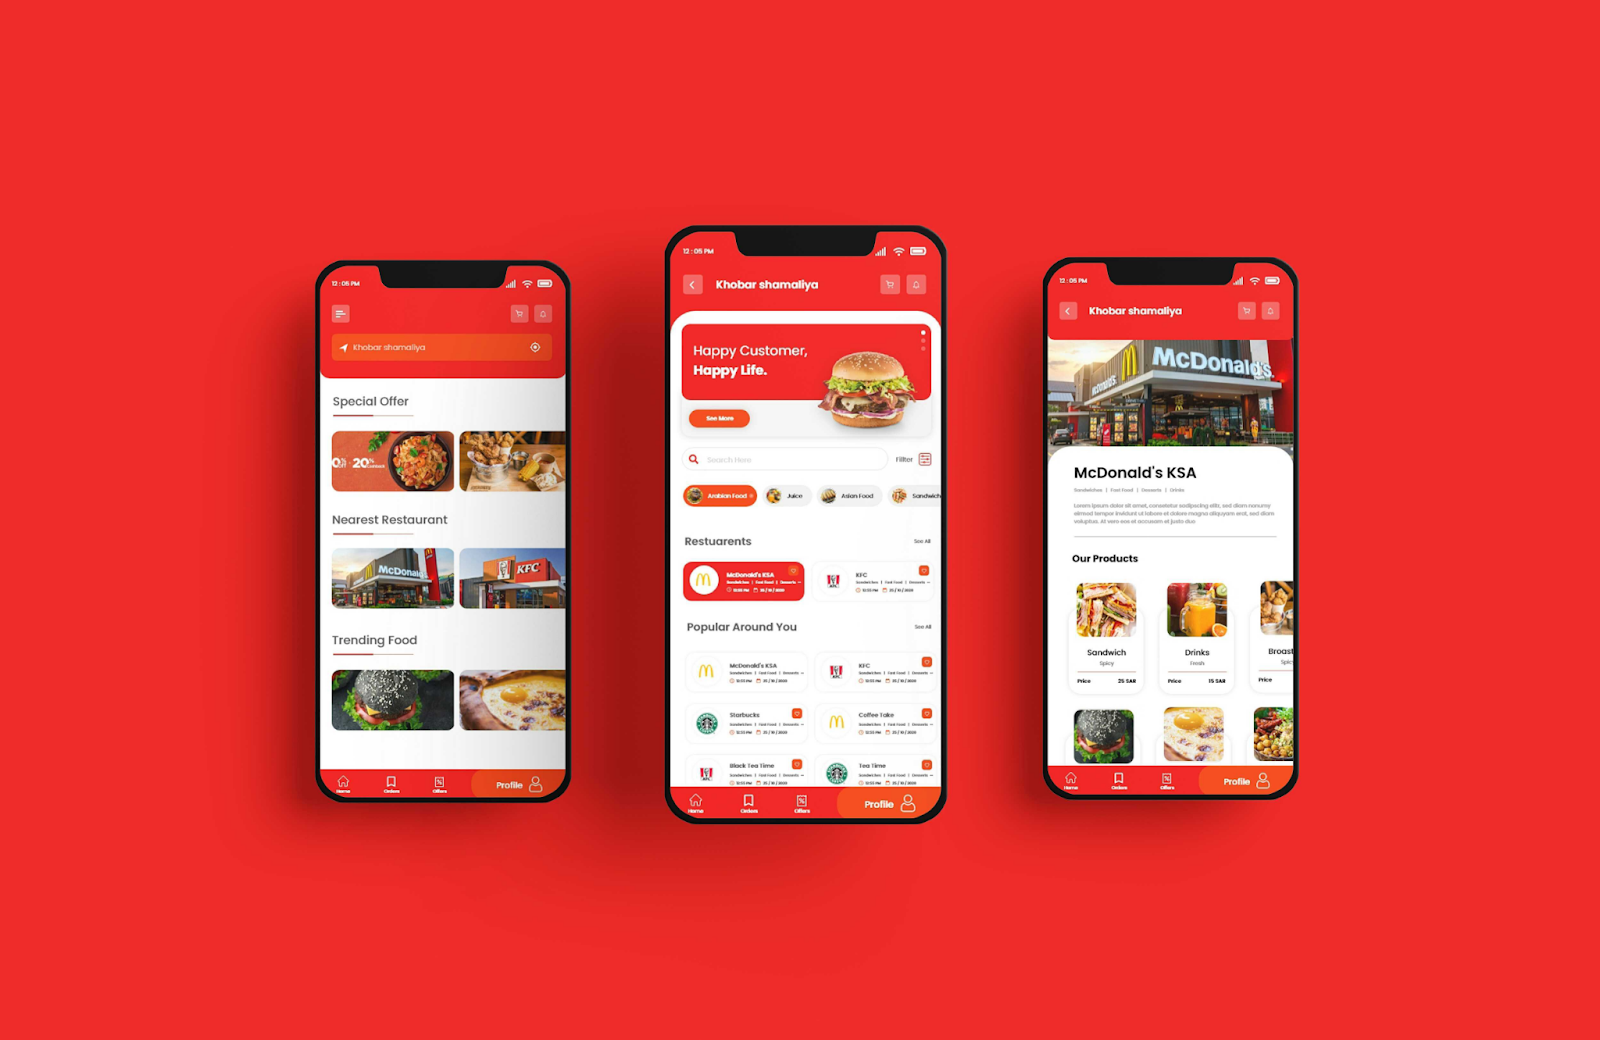 Restaurant Table Reservation Cum Order Booking App - YelloStack Mobile App Development Company in Saudi Arabia